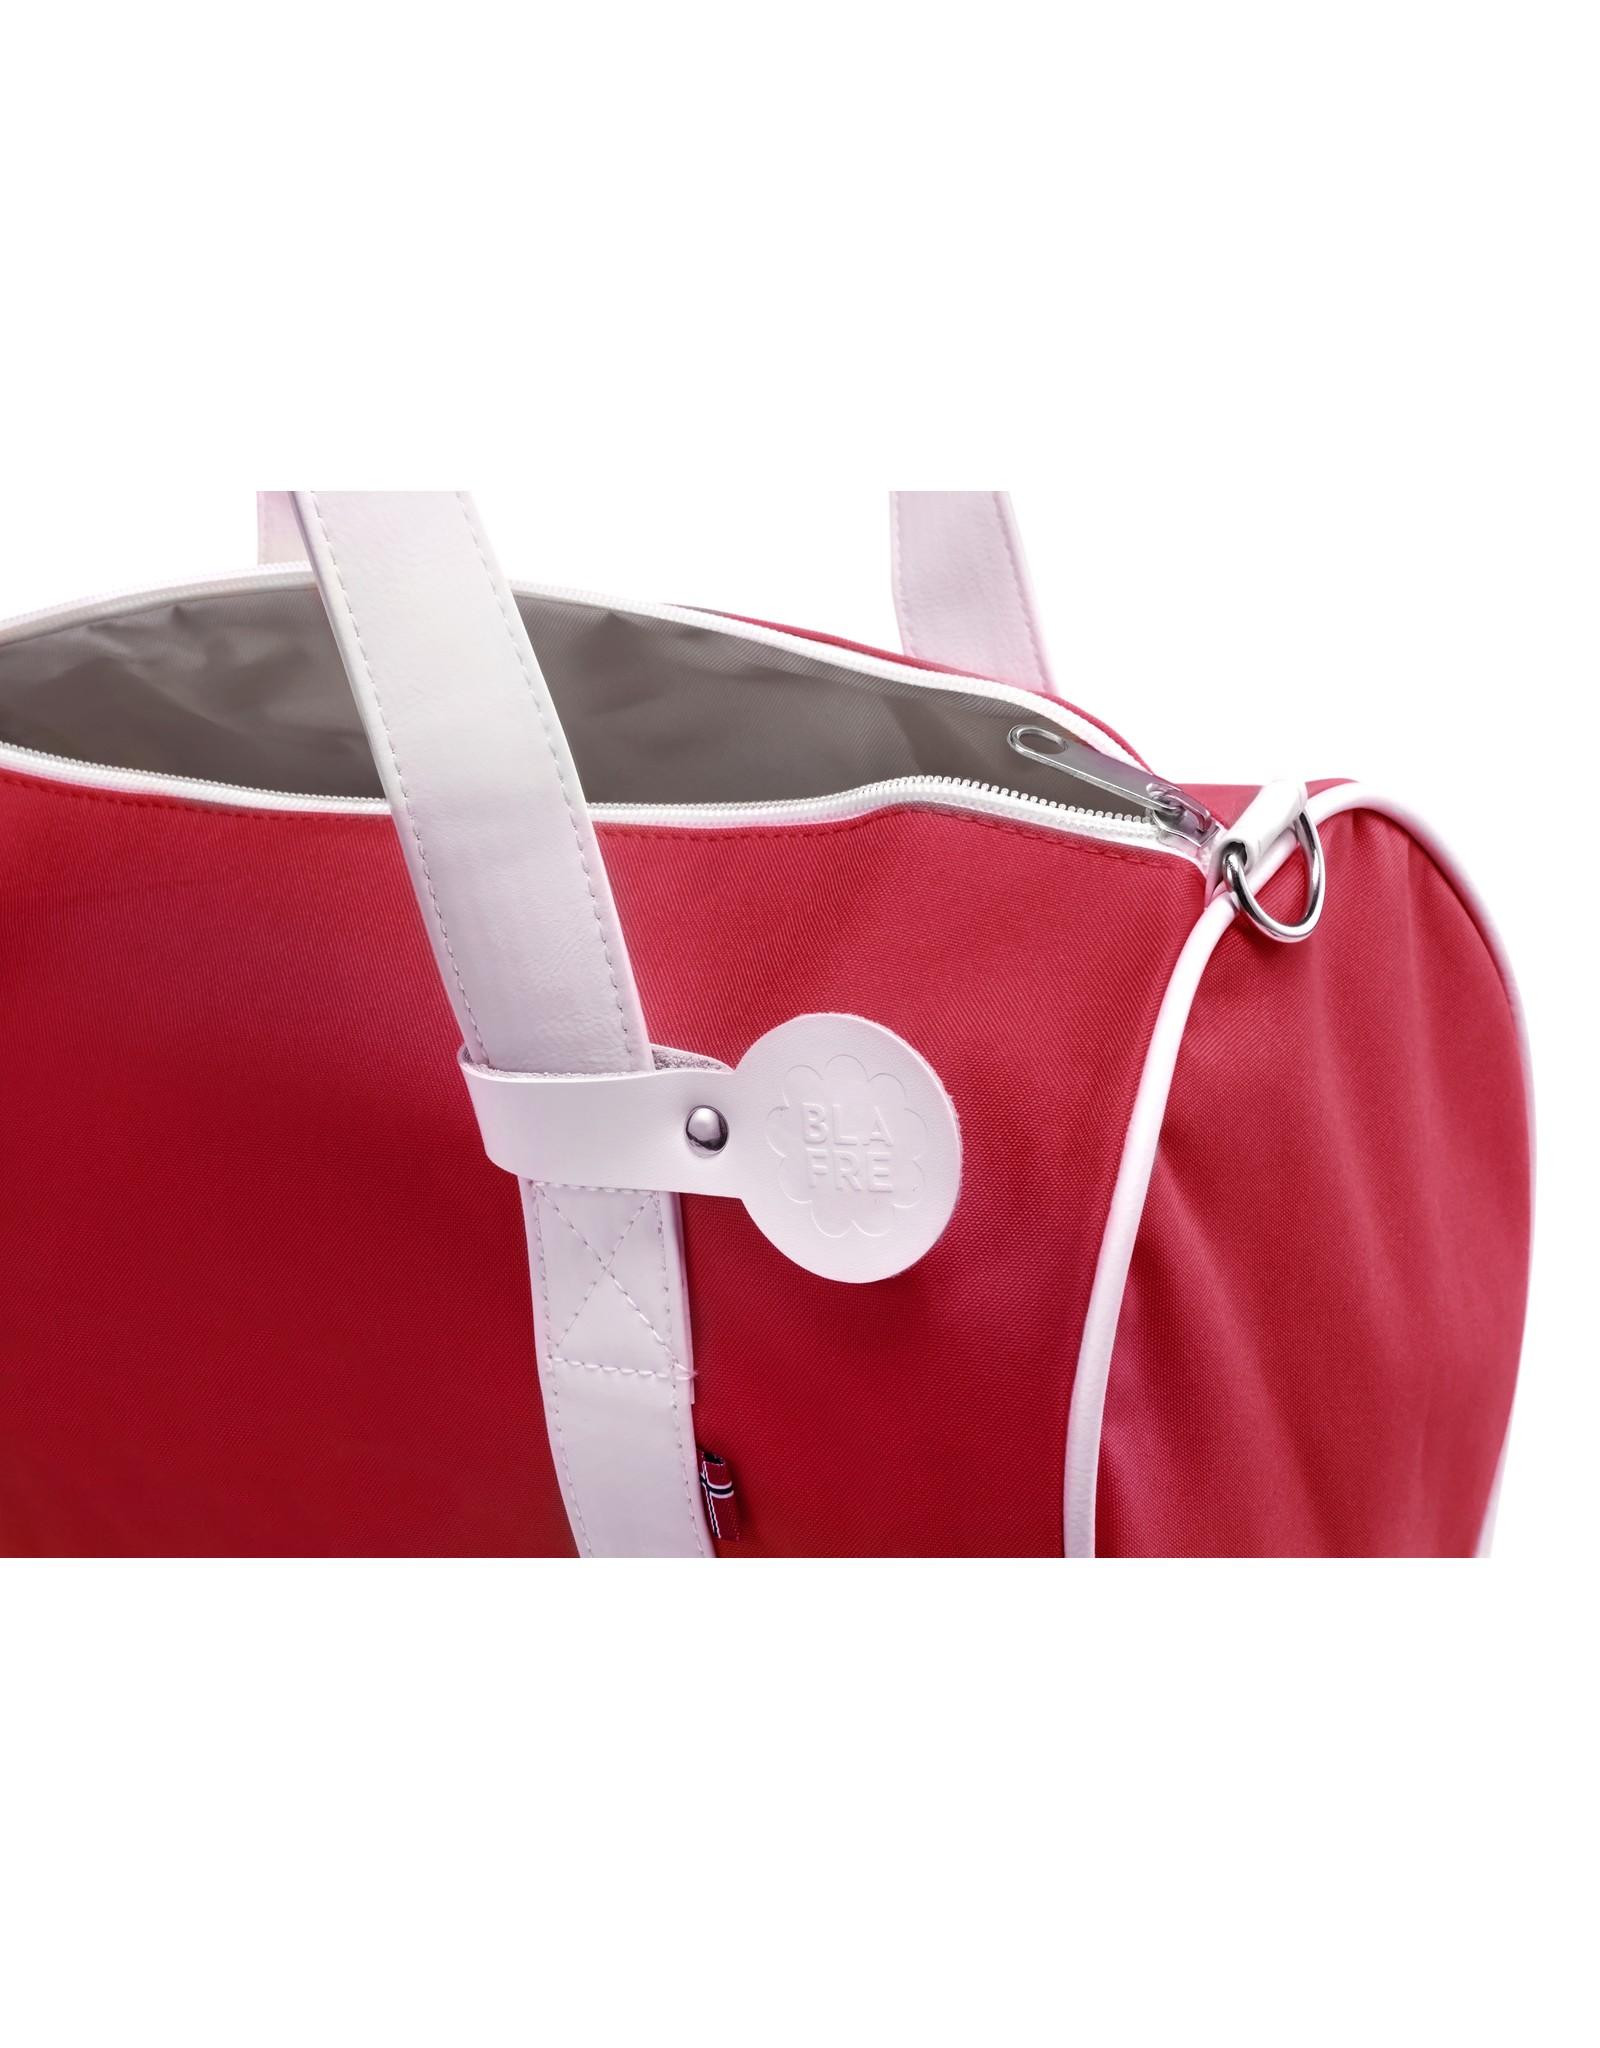 BLAFRE Blafre sac rouge